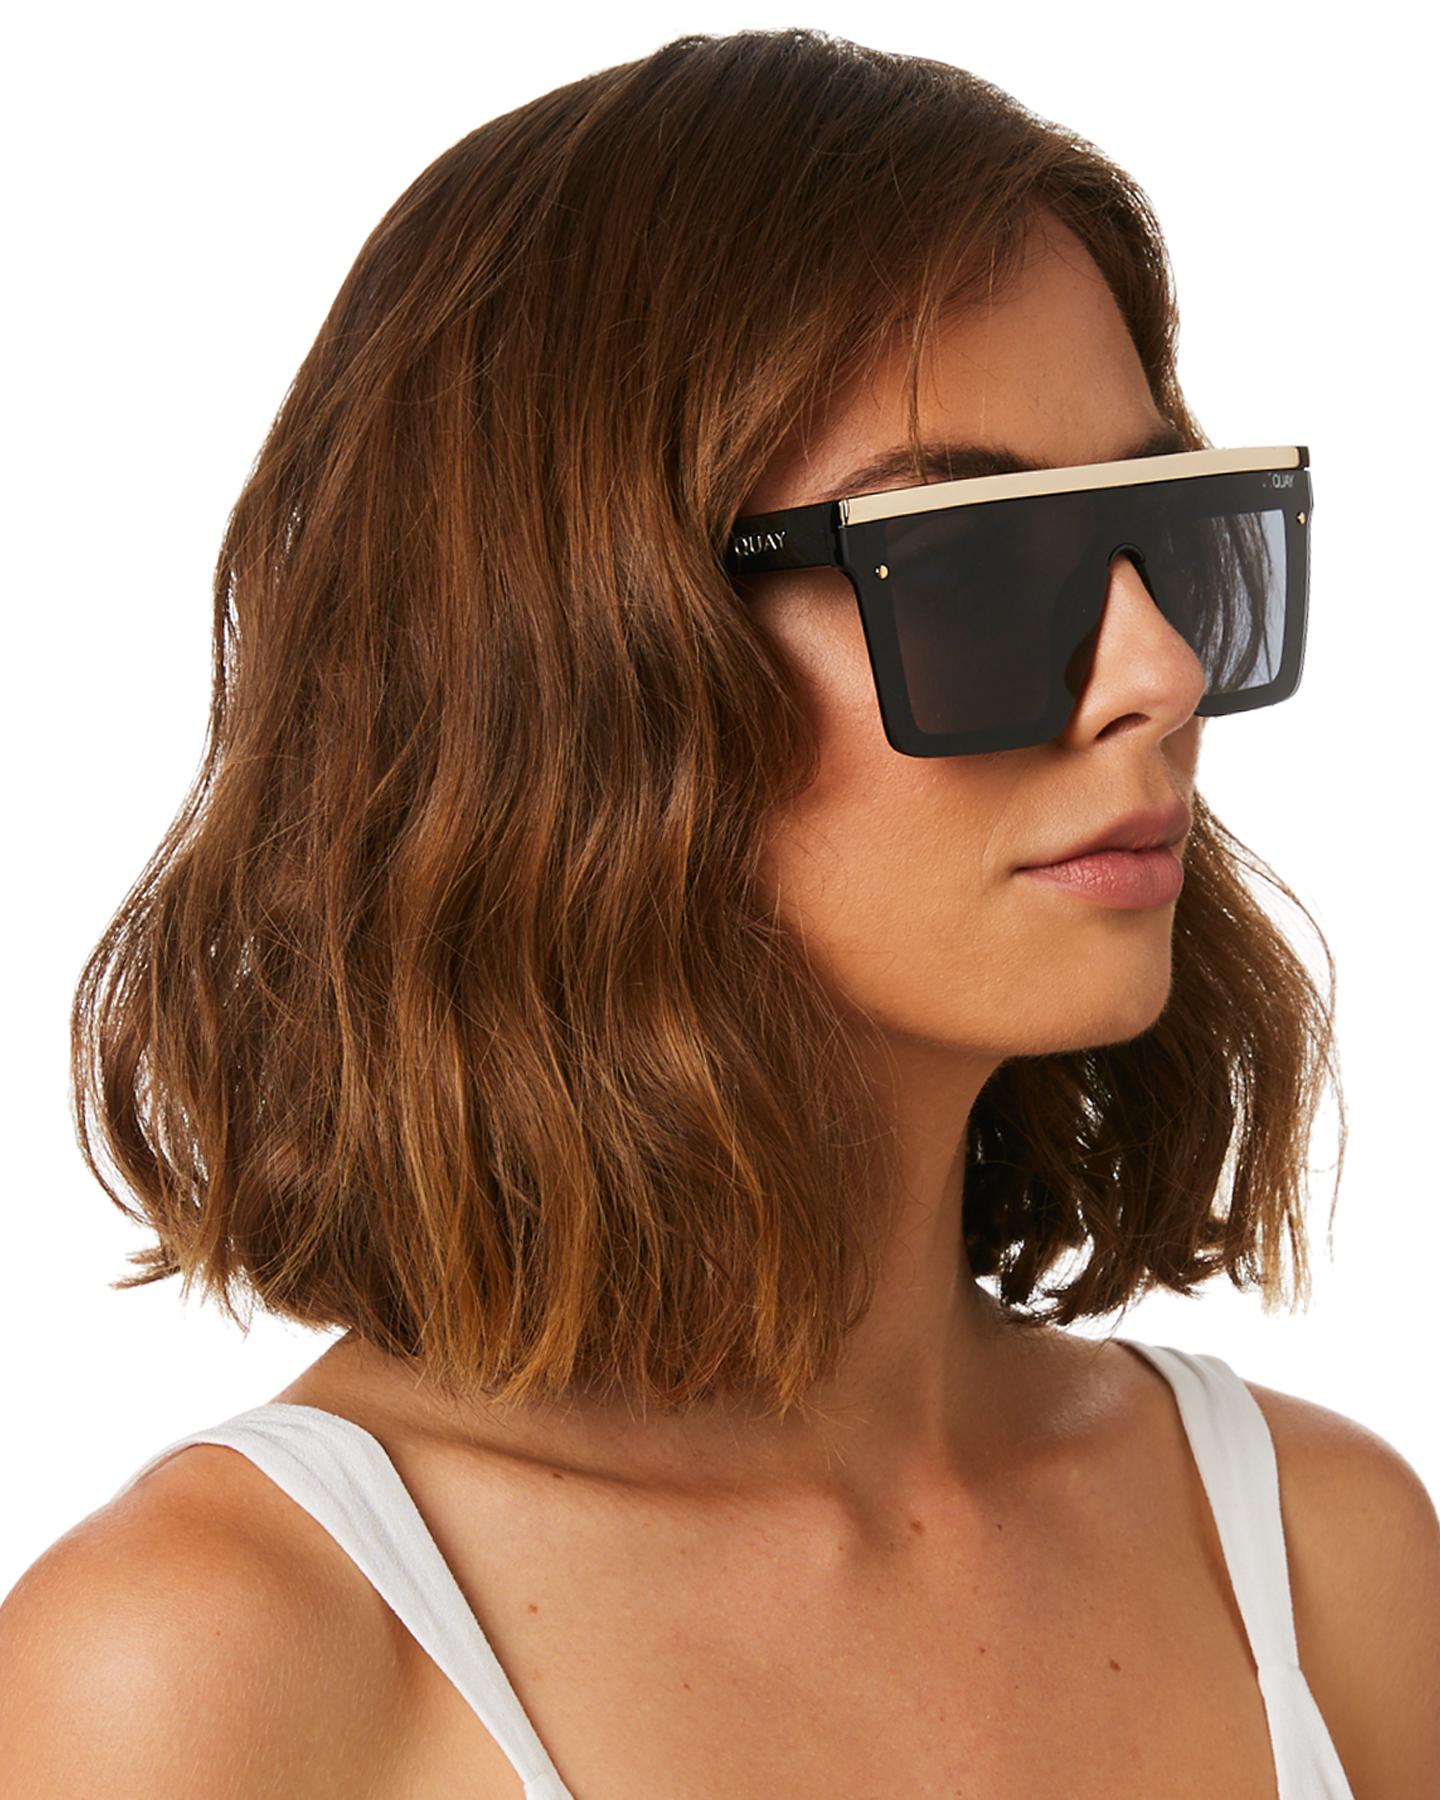 New-Quay-Eyewear-Women-039-s-Hindsight-Sunglasses-Stainless-Steel-Glass-Pink thumbnail 10